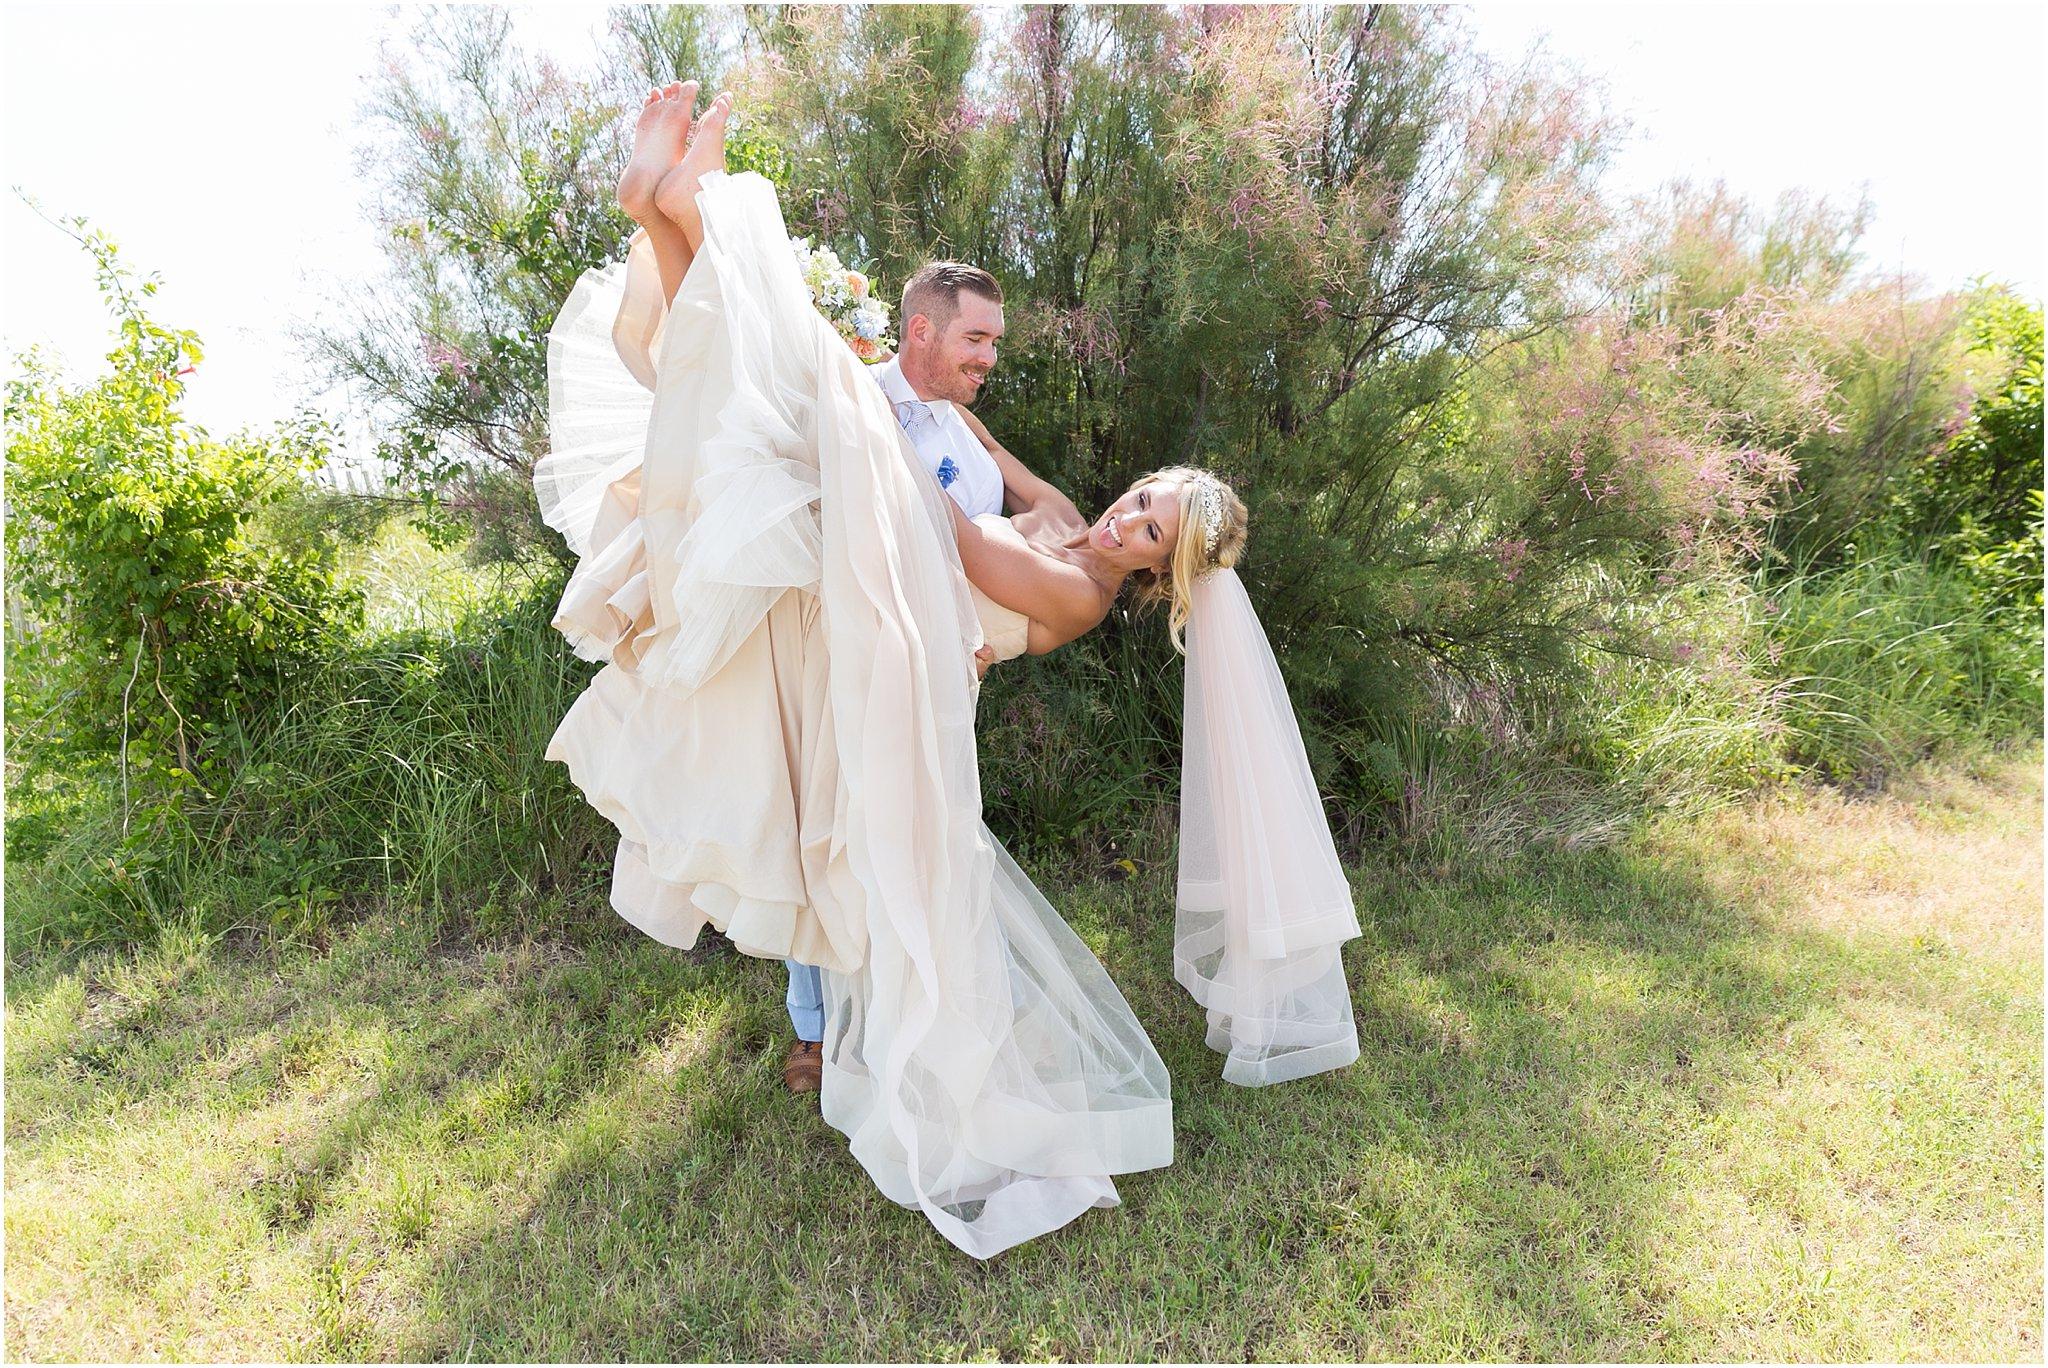 jessica_ryan_photography_wedding_hampton_roads_virginia_virginia_beach_weddings_0623